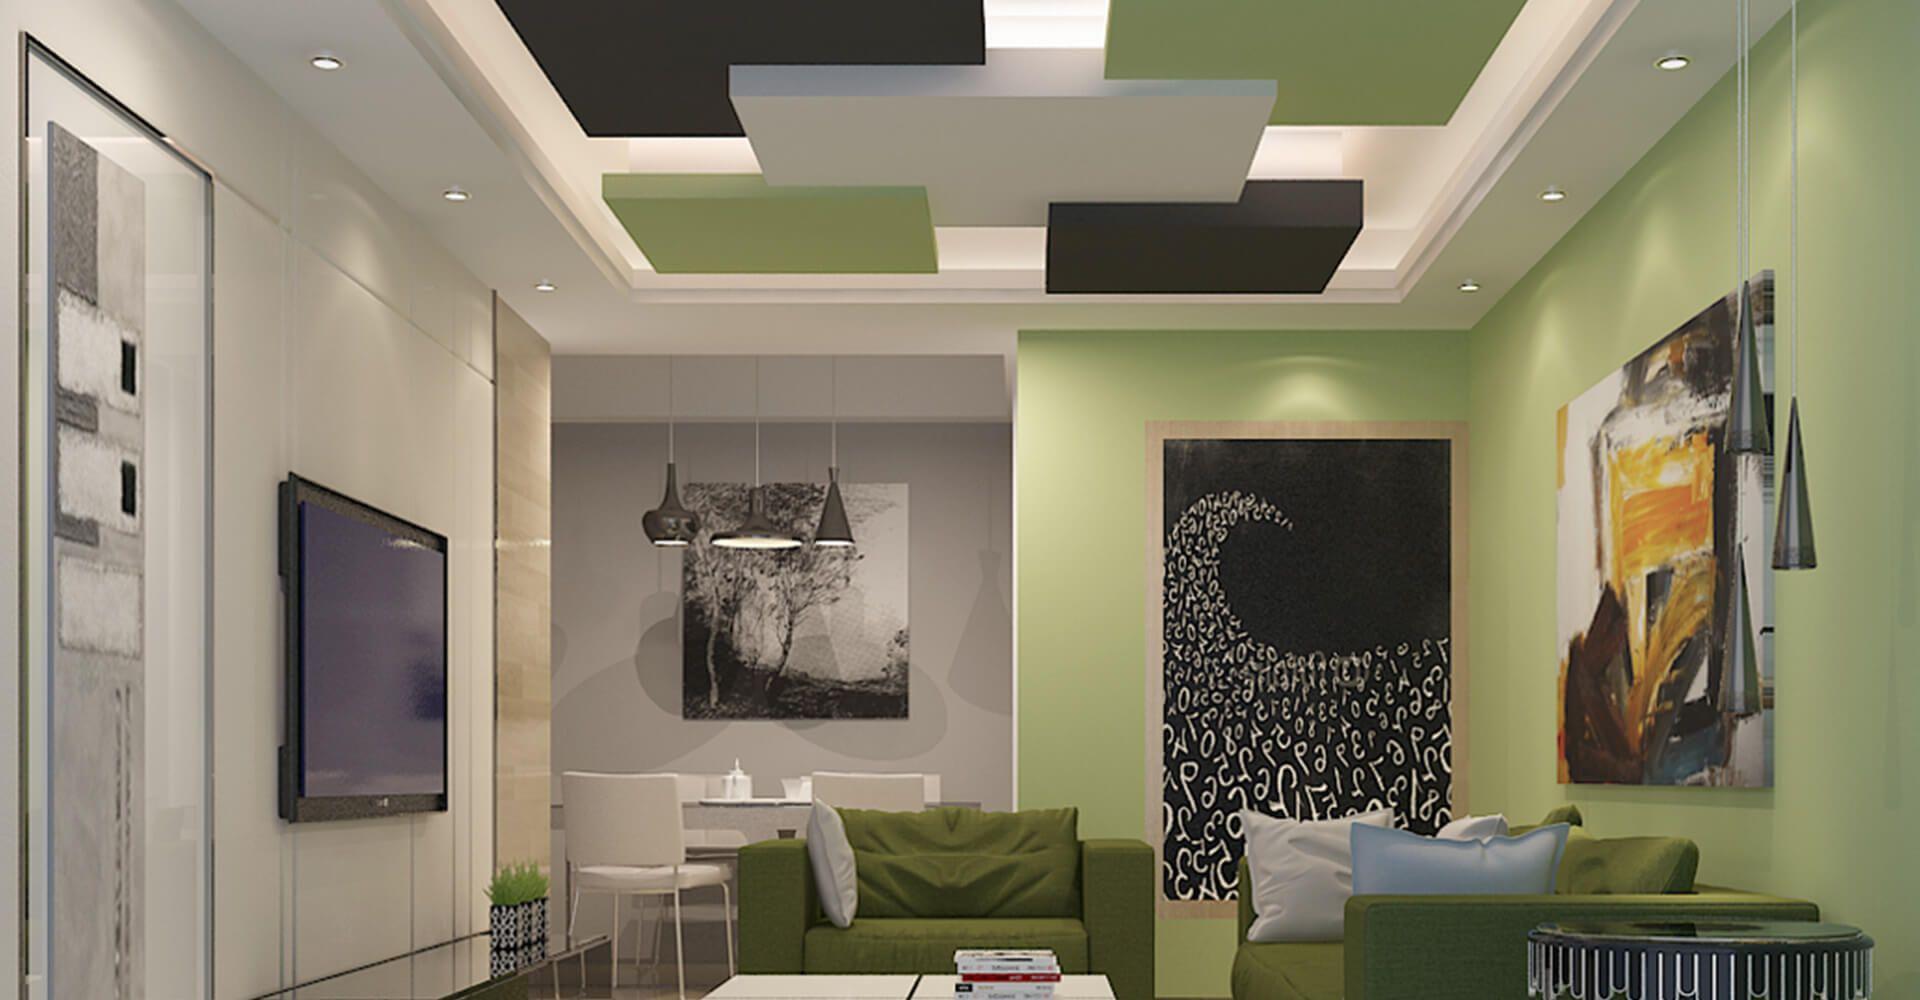 residential false ceiling | False Ceiling | Gypsum Board | Drywall ...